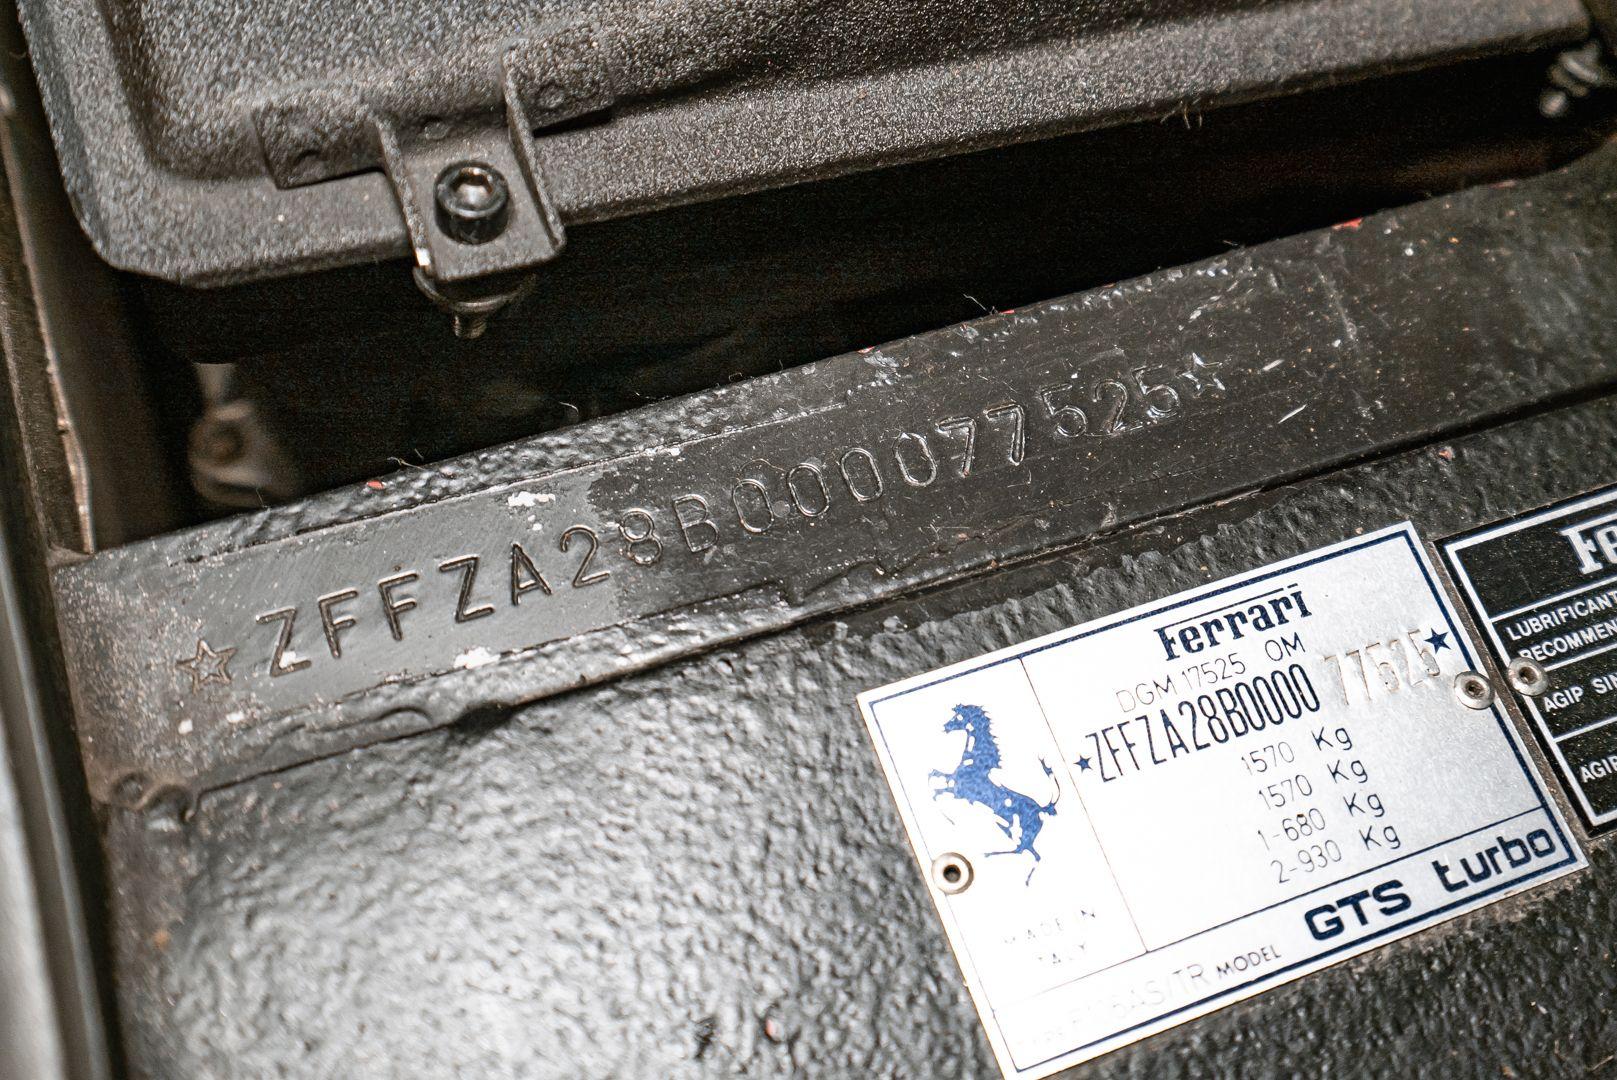 1988 FERRARI 208 GTS TURBO INTERCOOLER 75511